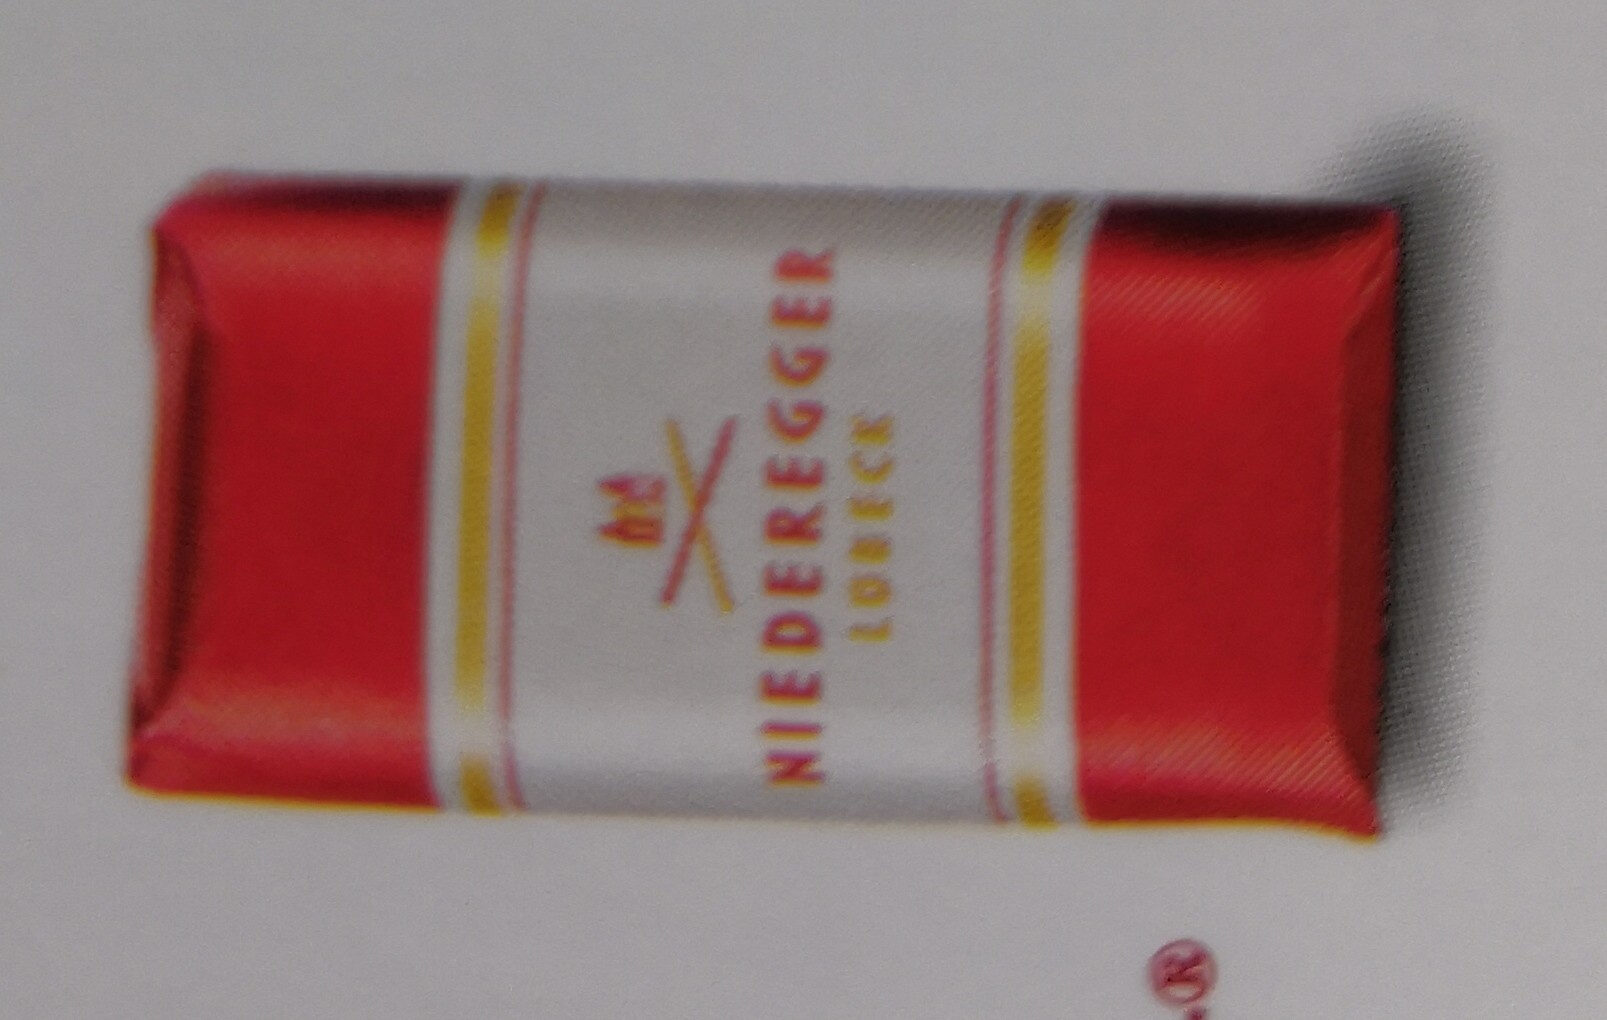 Niederegger Marzipan Klassiker 300G - Product - fr